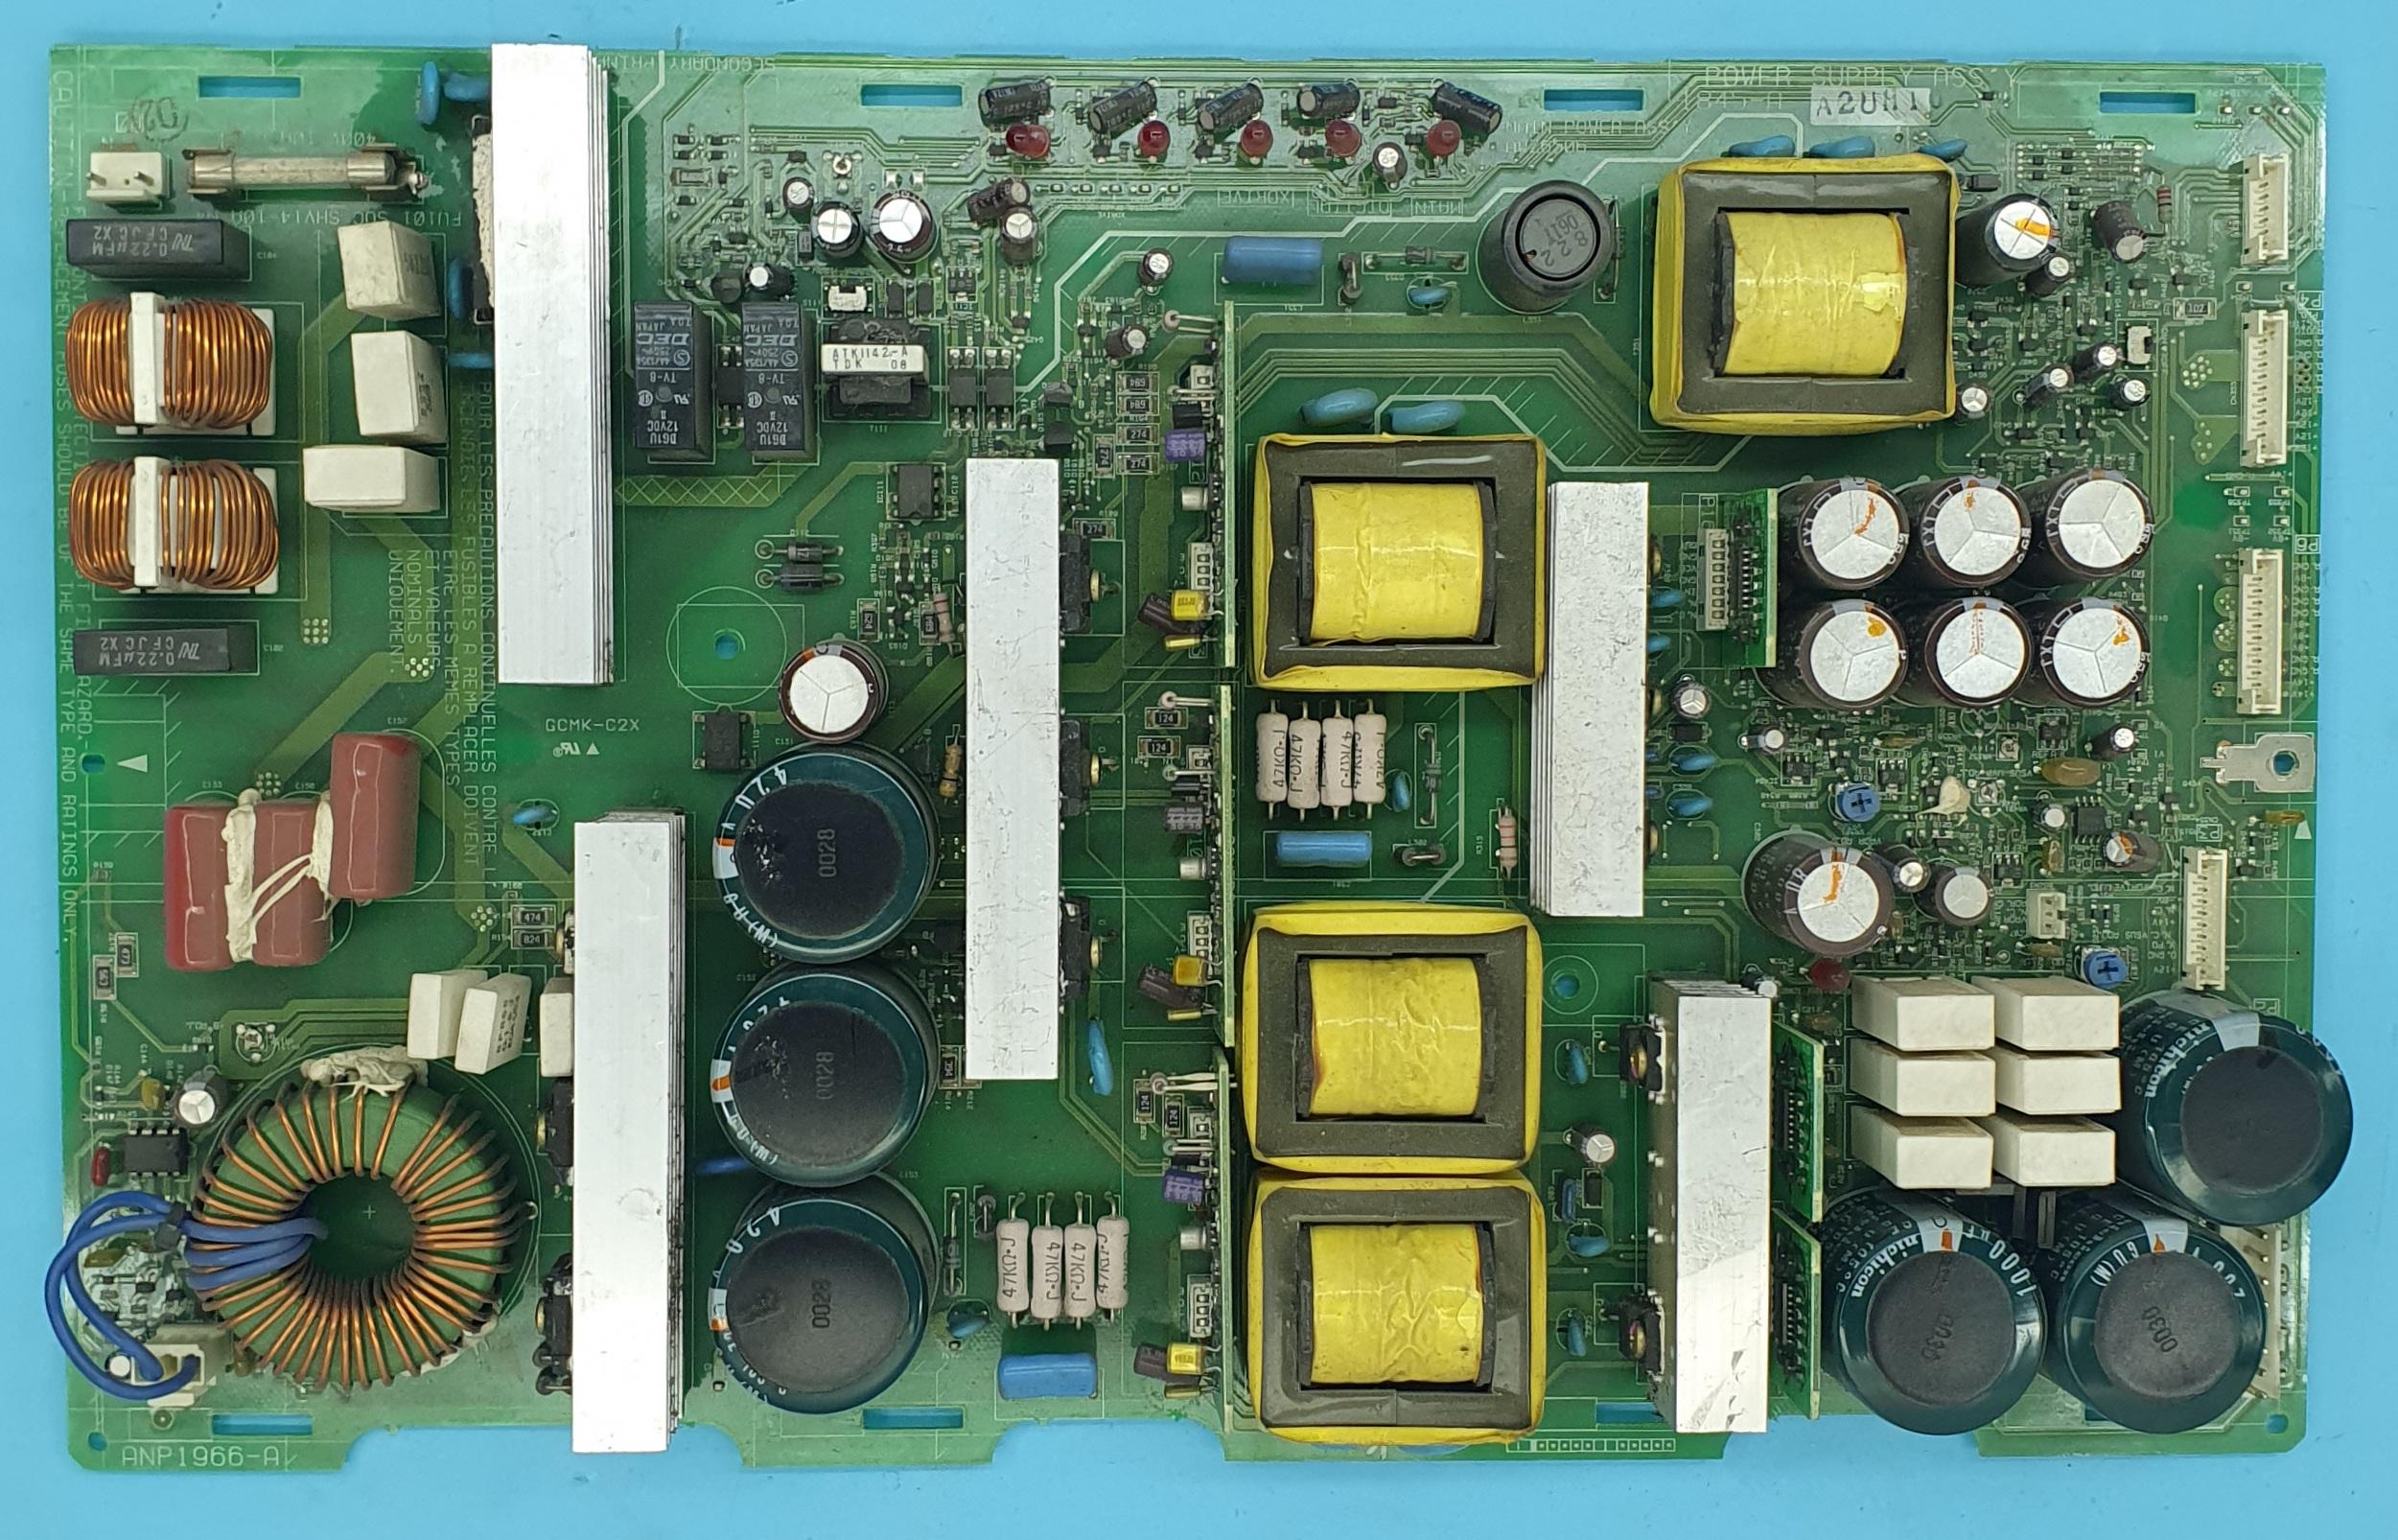 ANP1966-A Pioneer Power (KDV DAHİL = 200 TL)